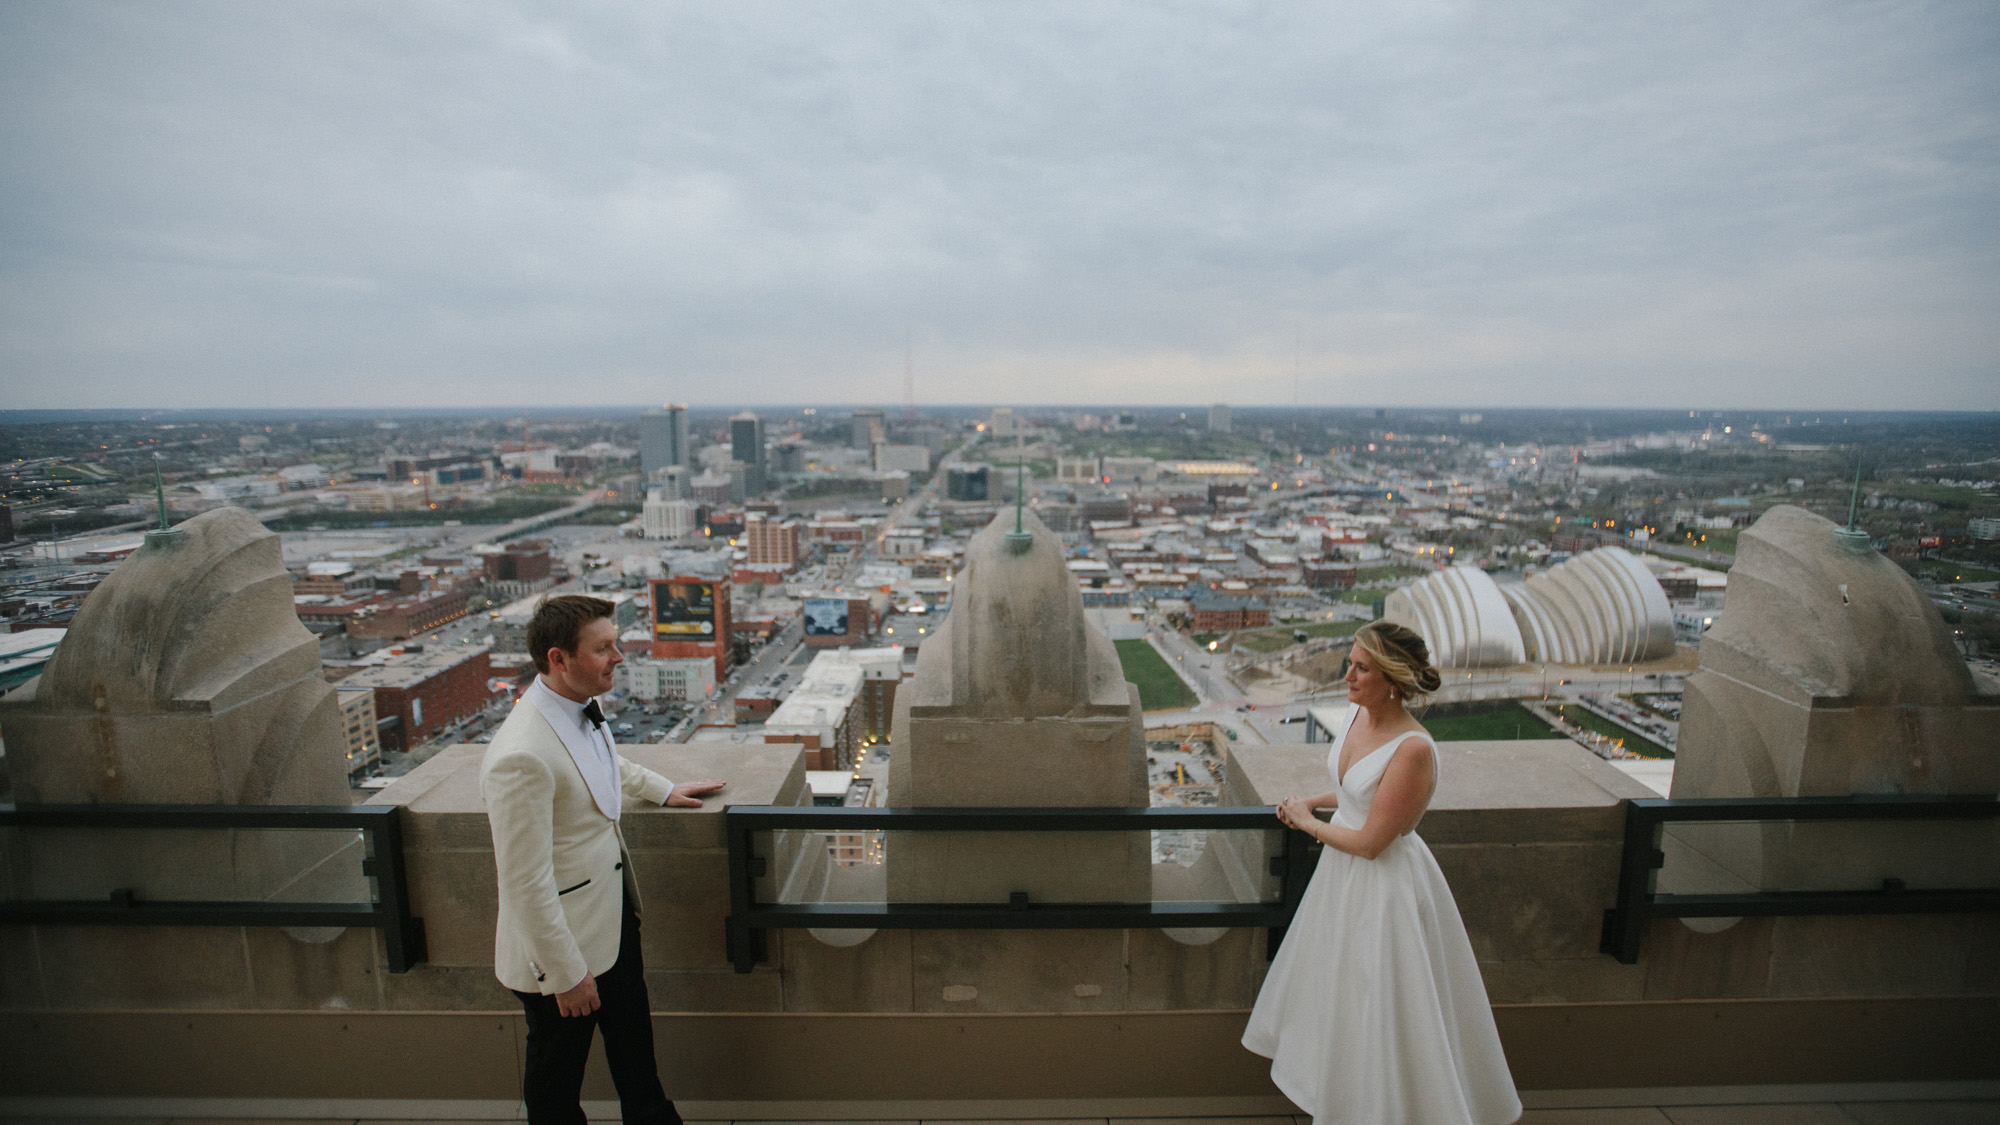 Alec_Vanderboom_kansas_city_hip_wedding_photos-0079.jpg